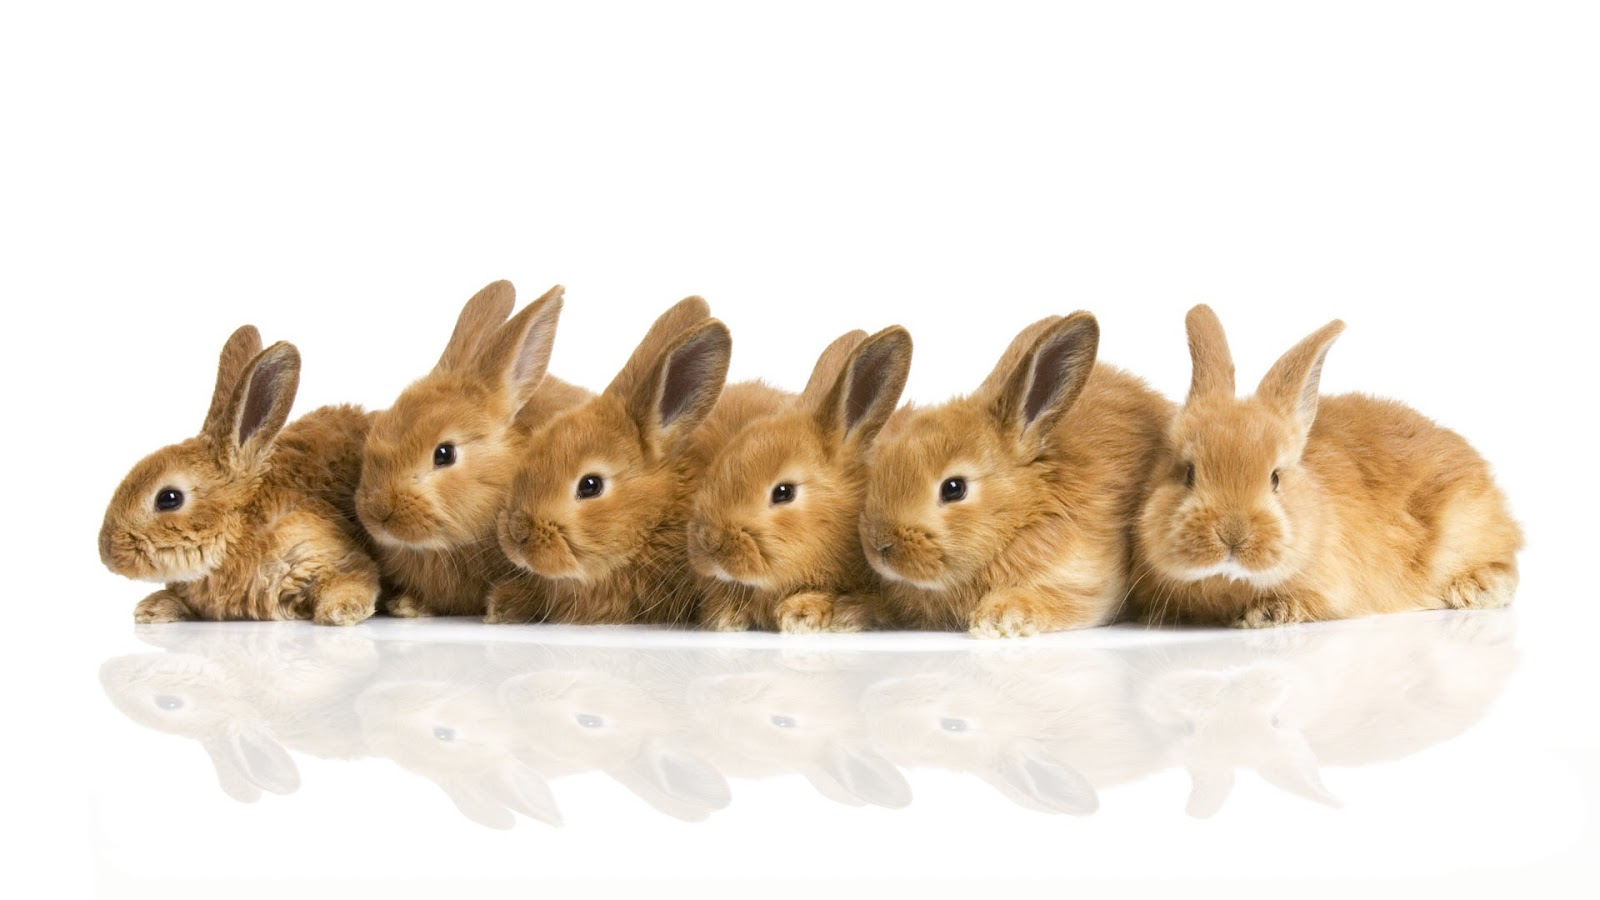 cute rabbit wallpaper - photo #22